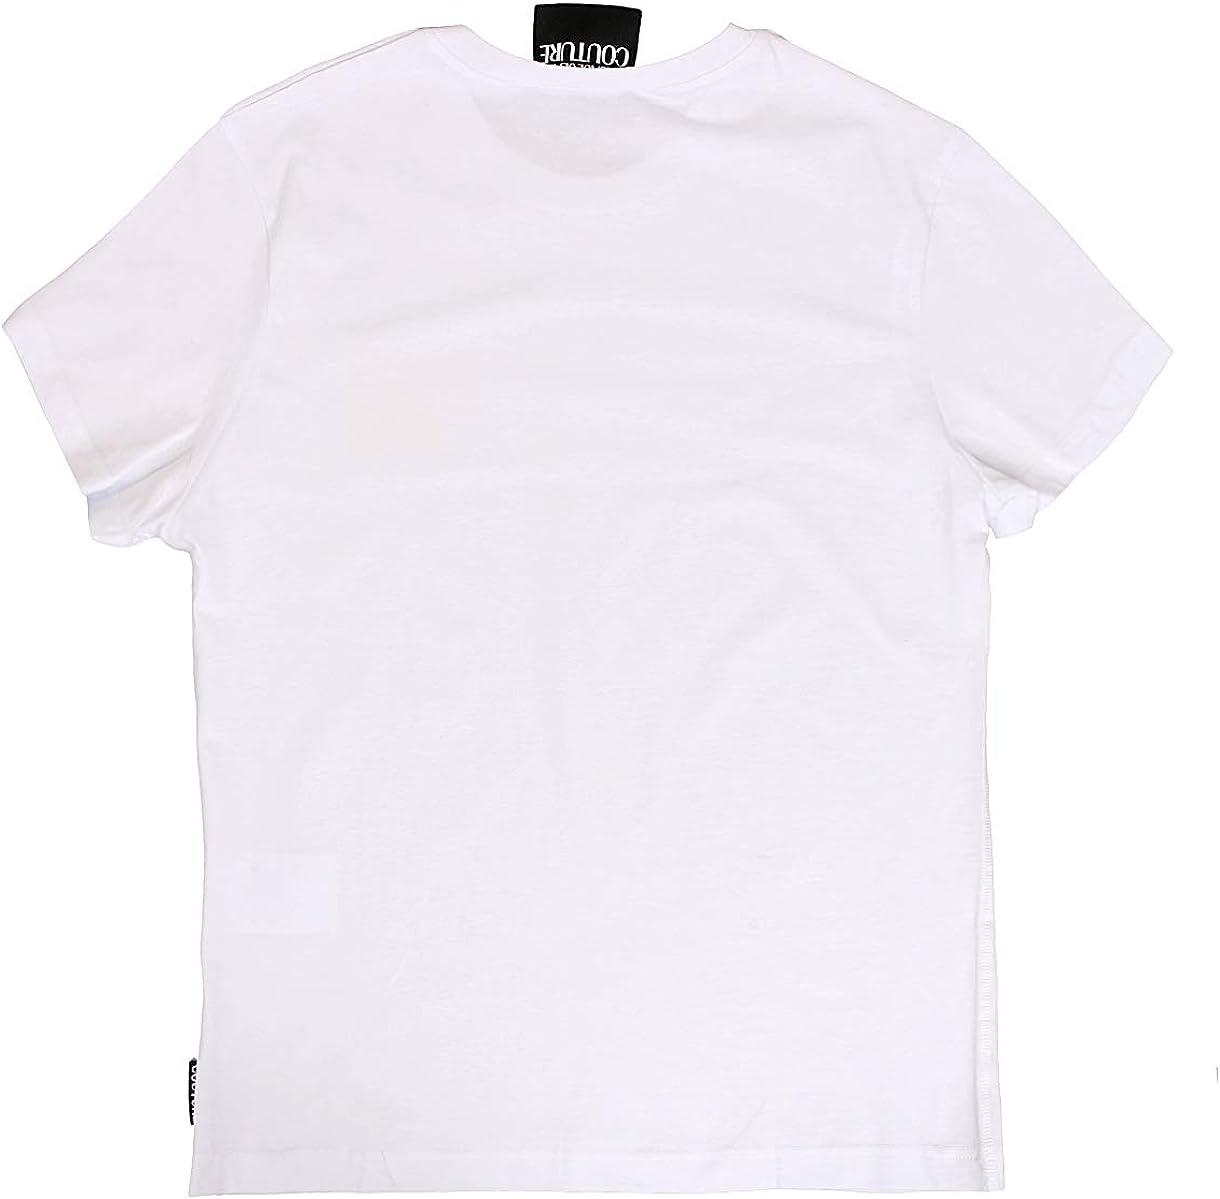 for Mens Versace White 100/% Cotton Classic Short Sleeve Crewneck T-Shirt